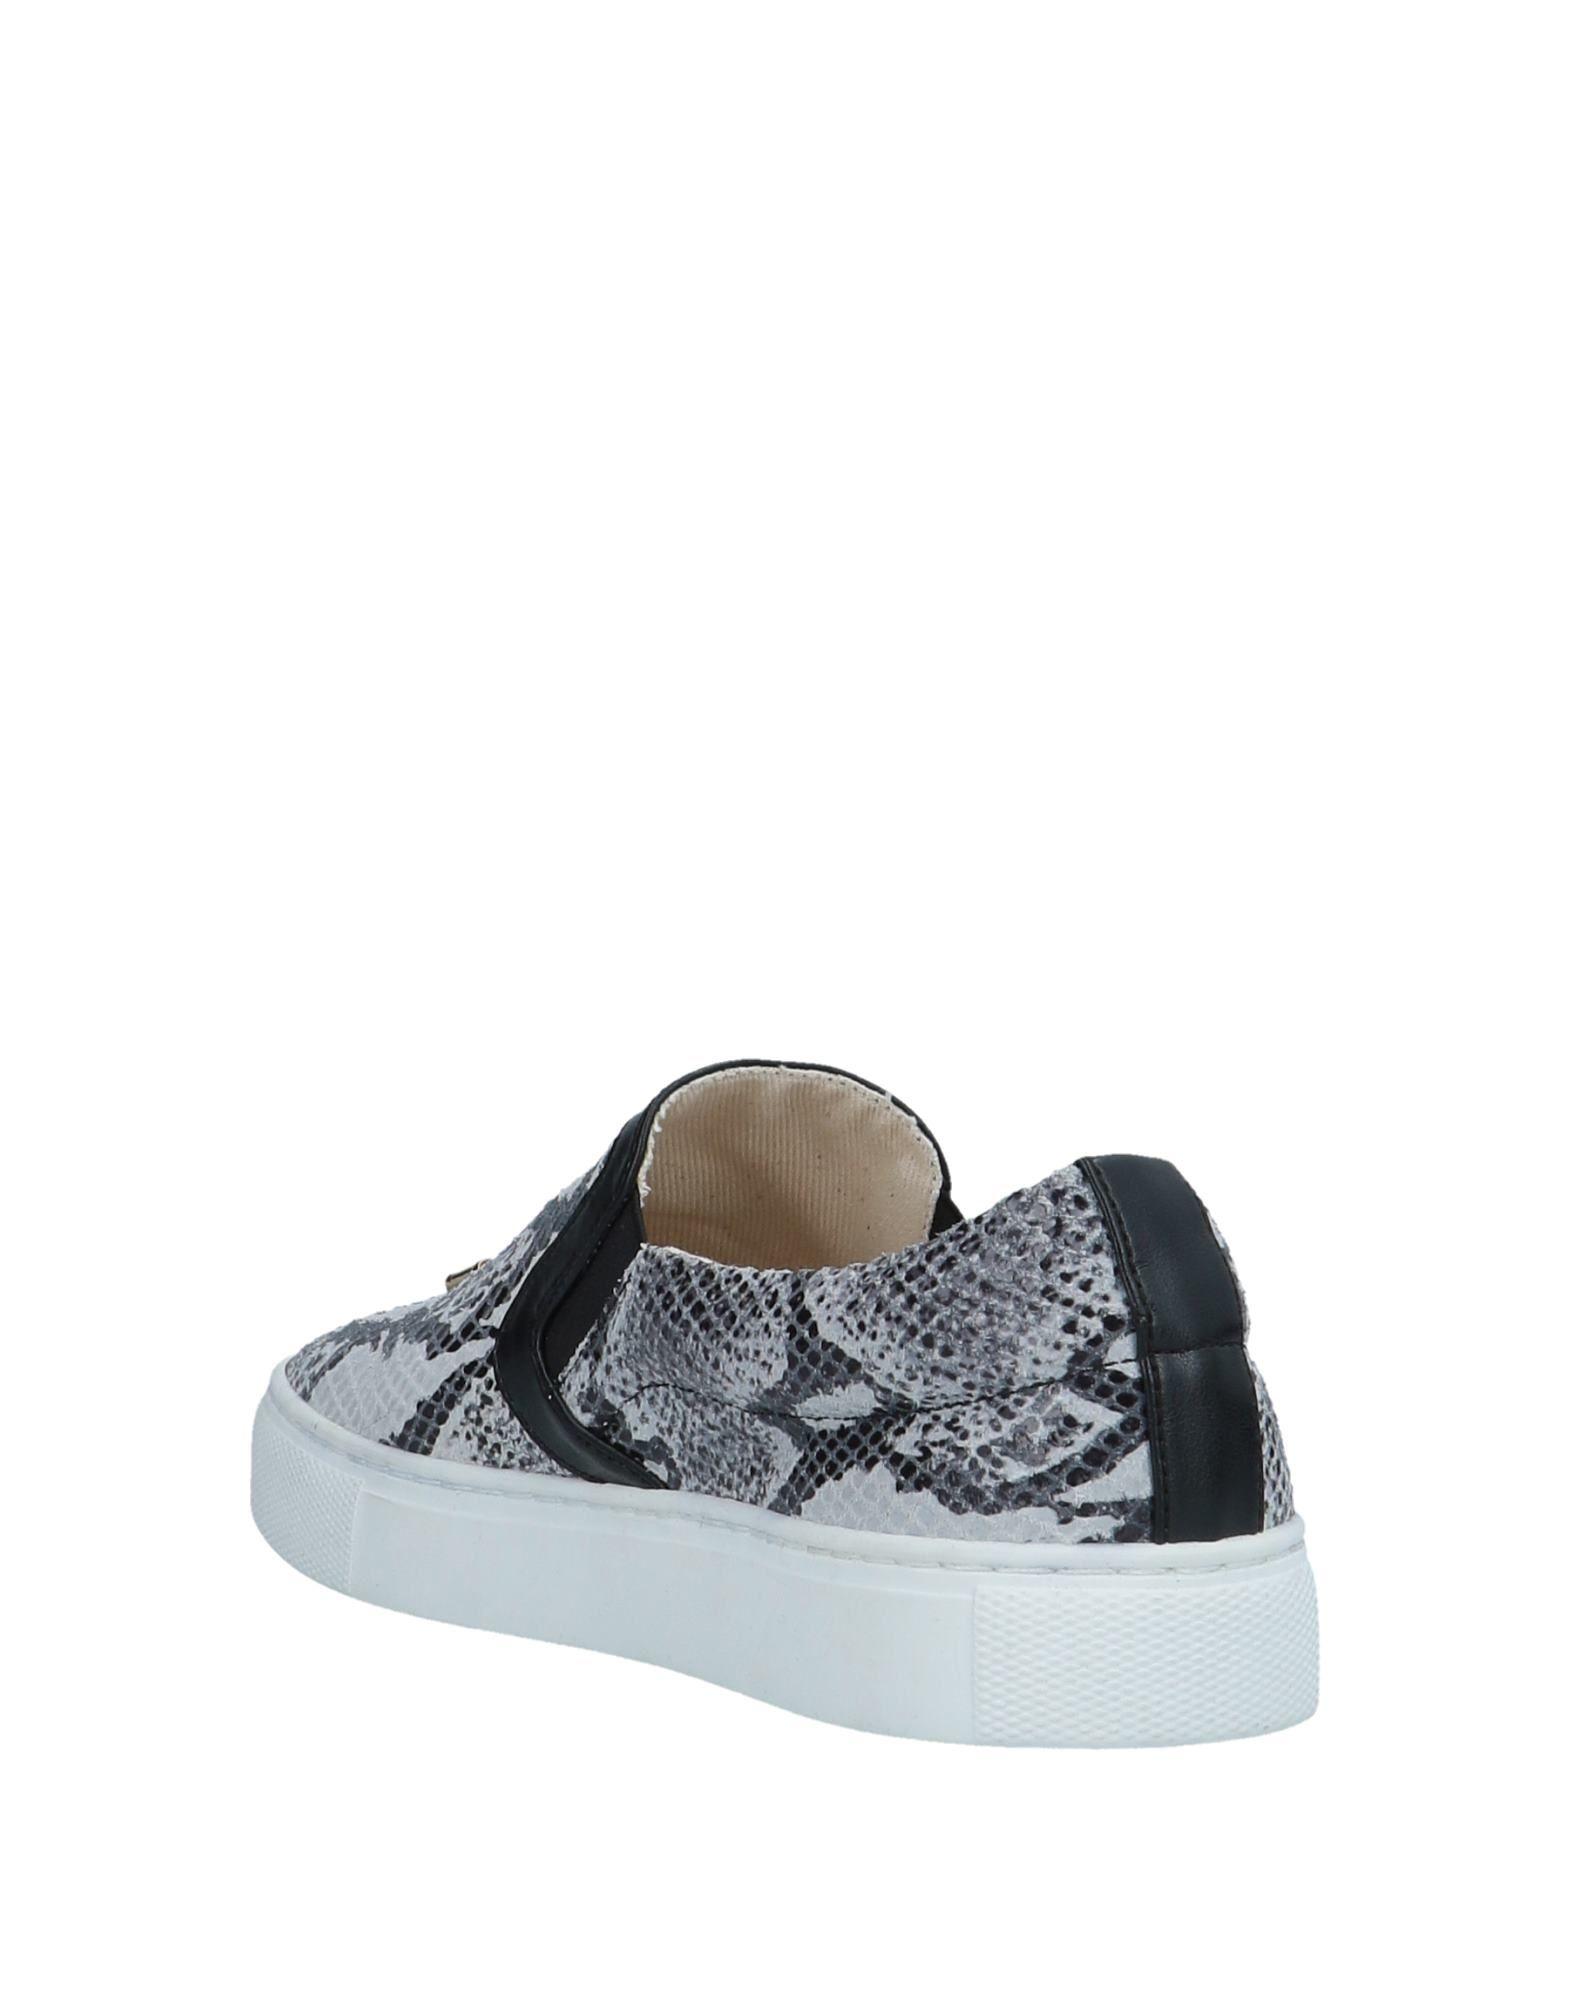 Stilvolle billige Schuhe Annarita 11560894QX N. Sneakers Damen  11560894QX Annarita e8cb11